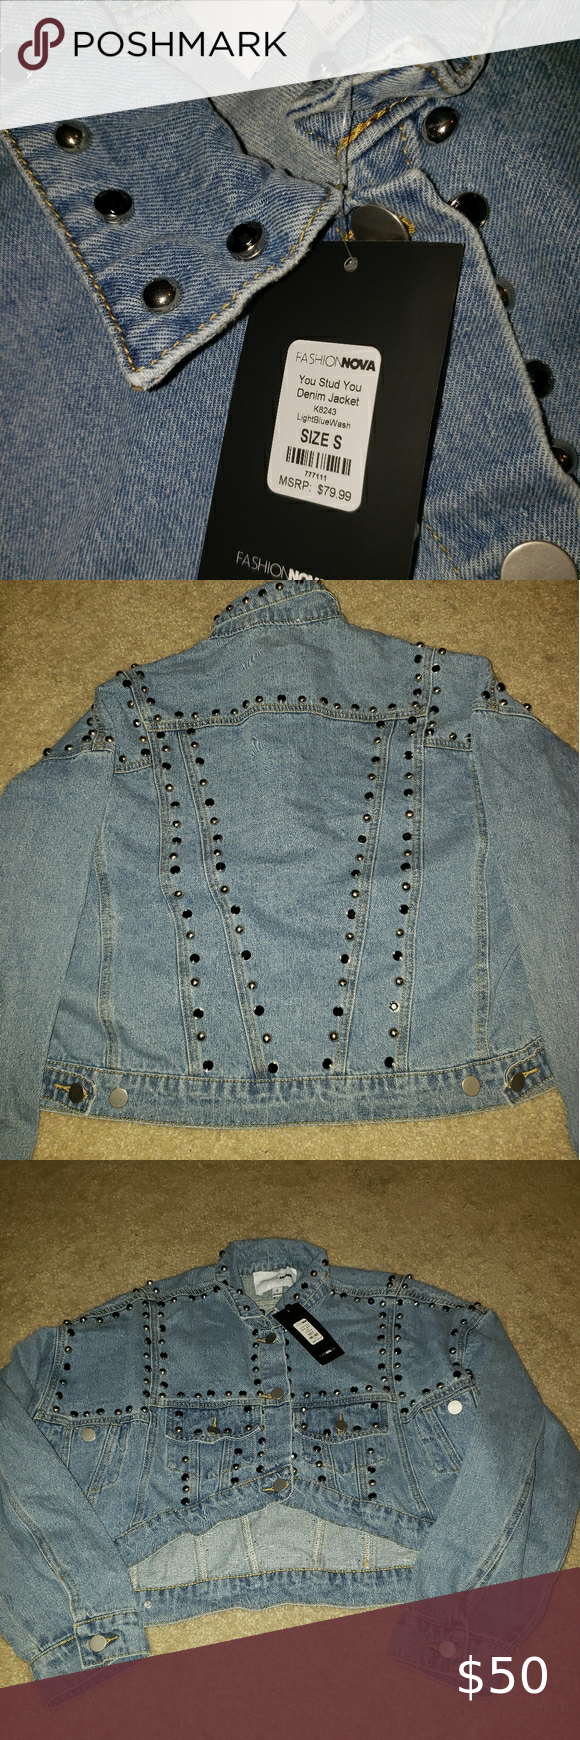 Jean Jacket In 2020 Jean Jacket Studded Jeans Womens Fashion Shopping